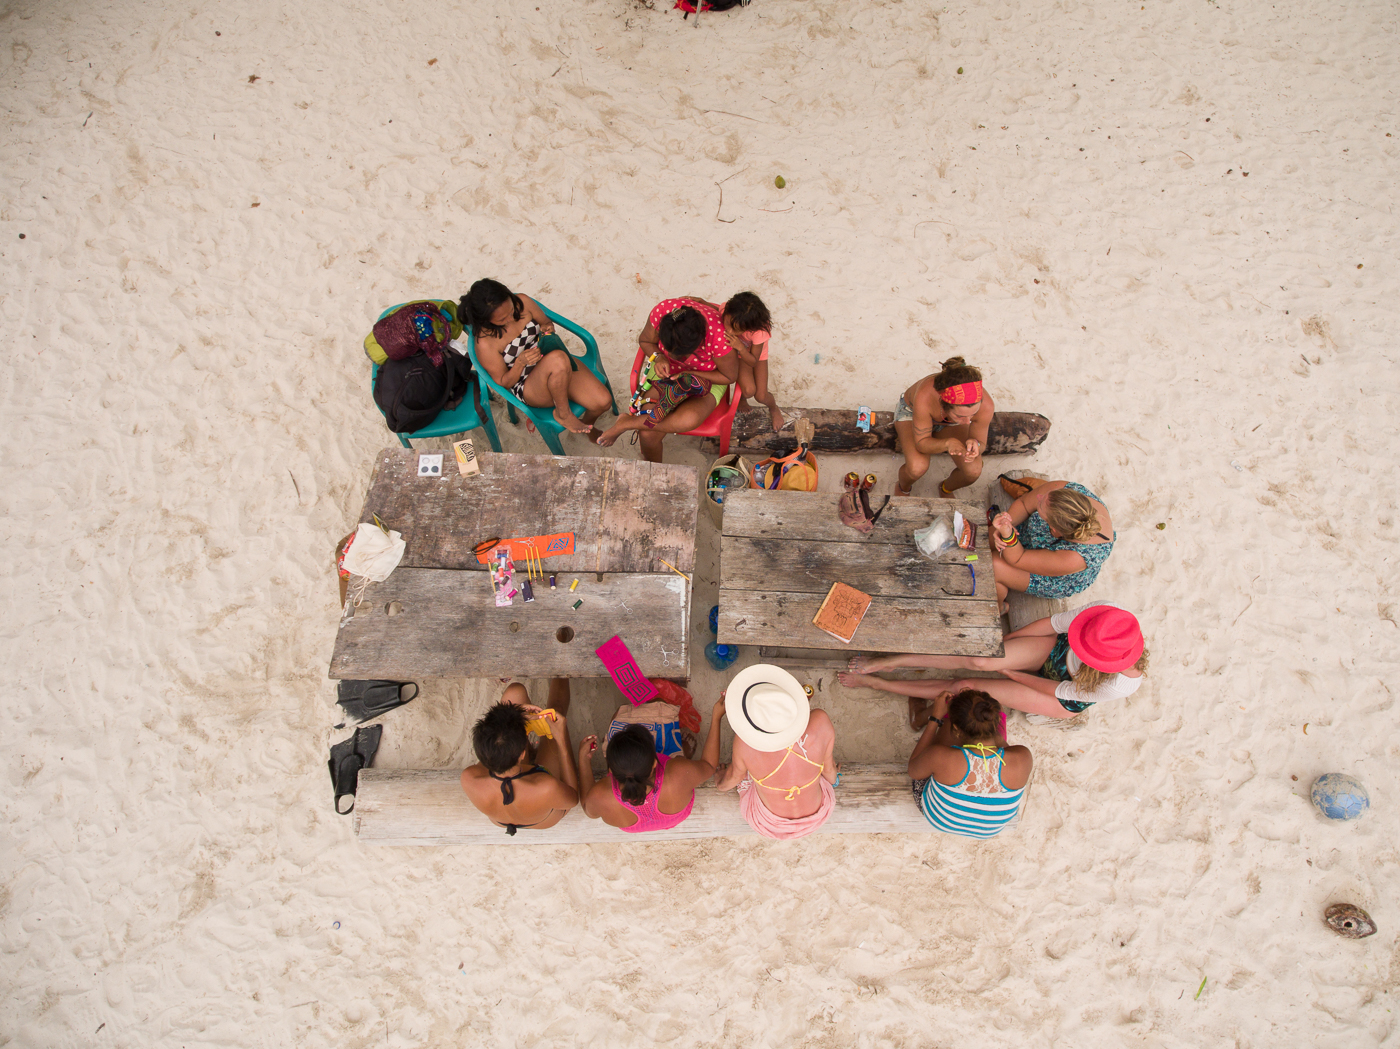 thread caravan panama embroidery table by karim iliya.jpg